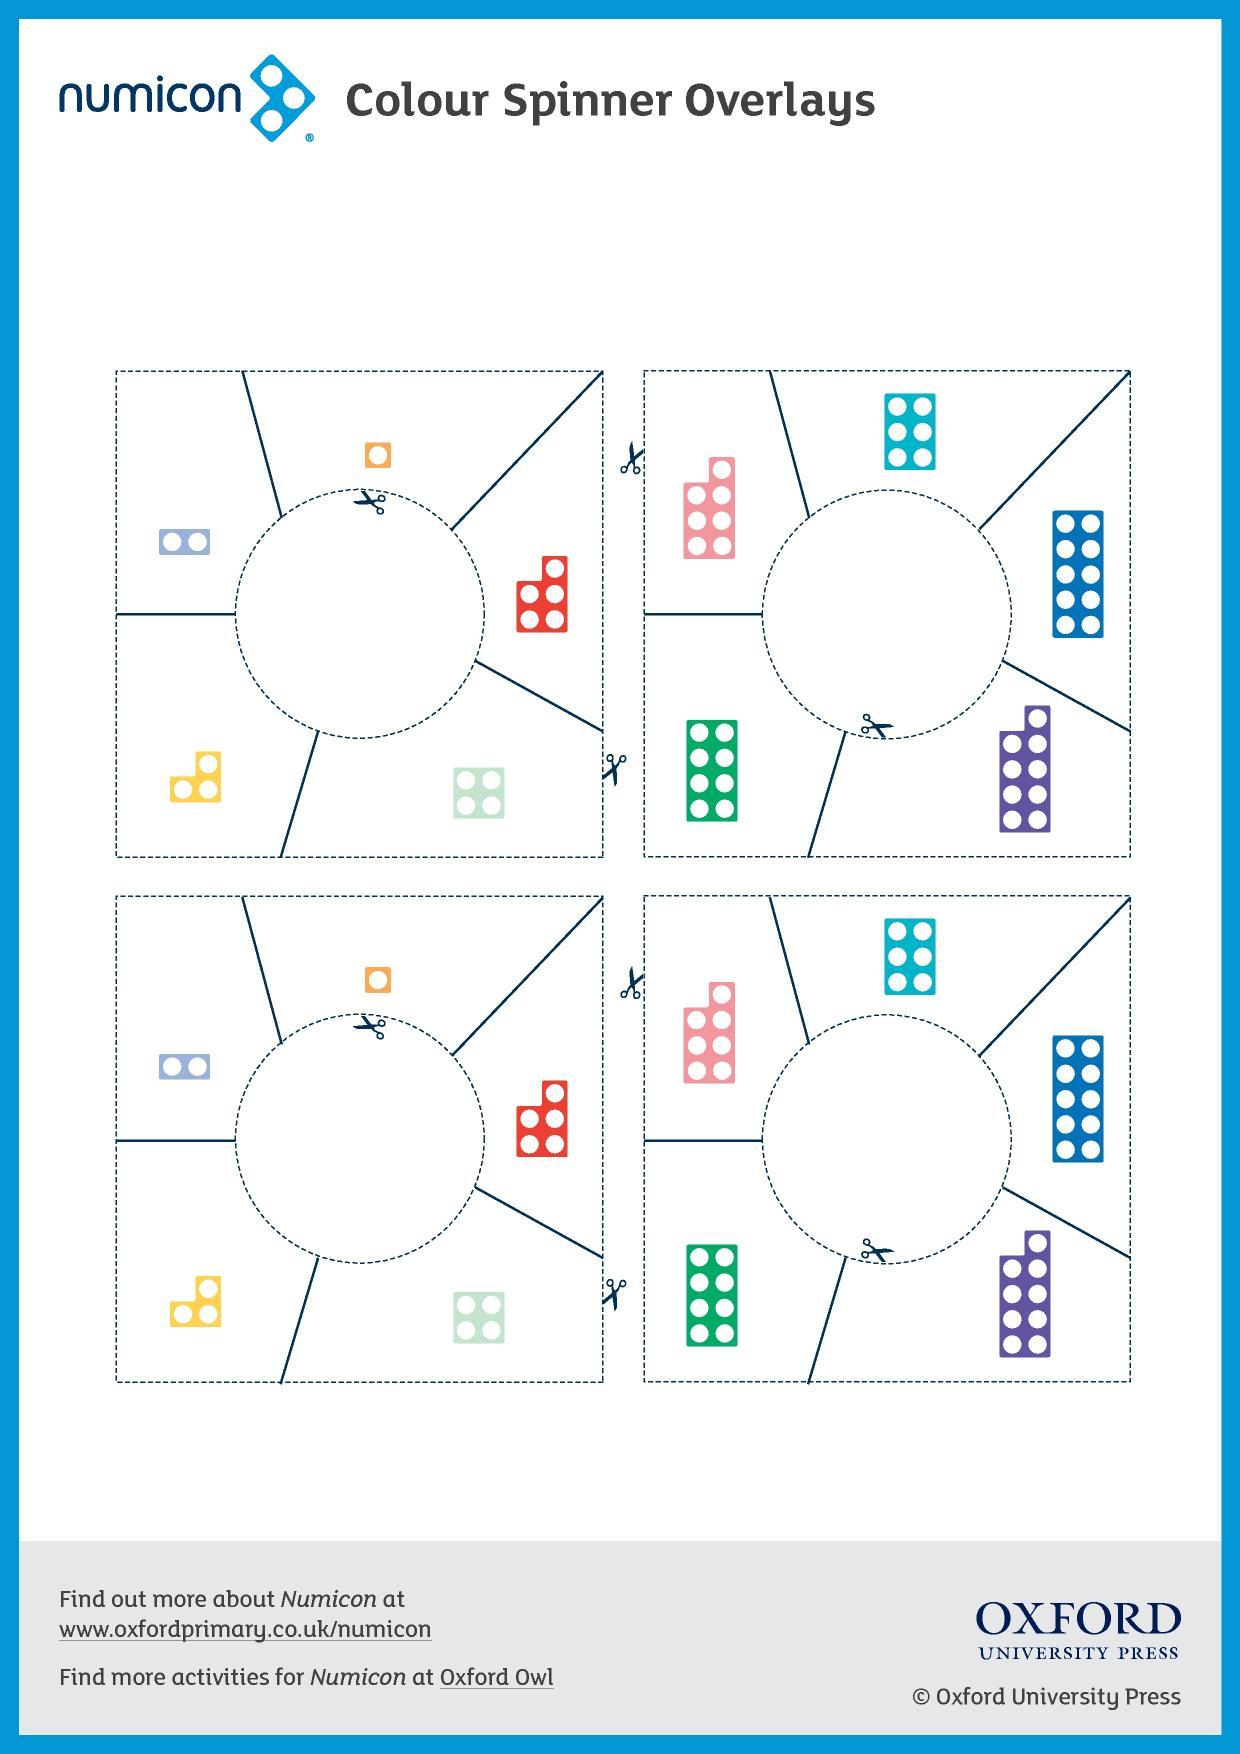 EYFS | KS1 | KS2 | Addition and subtraction the basics ...